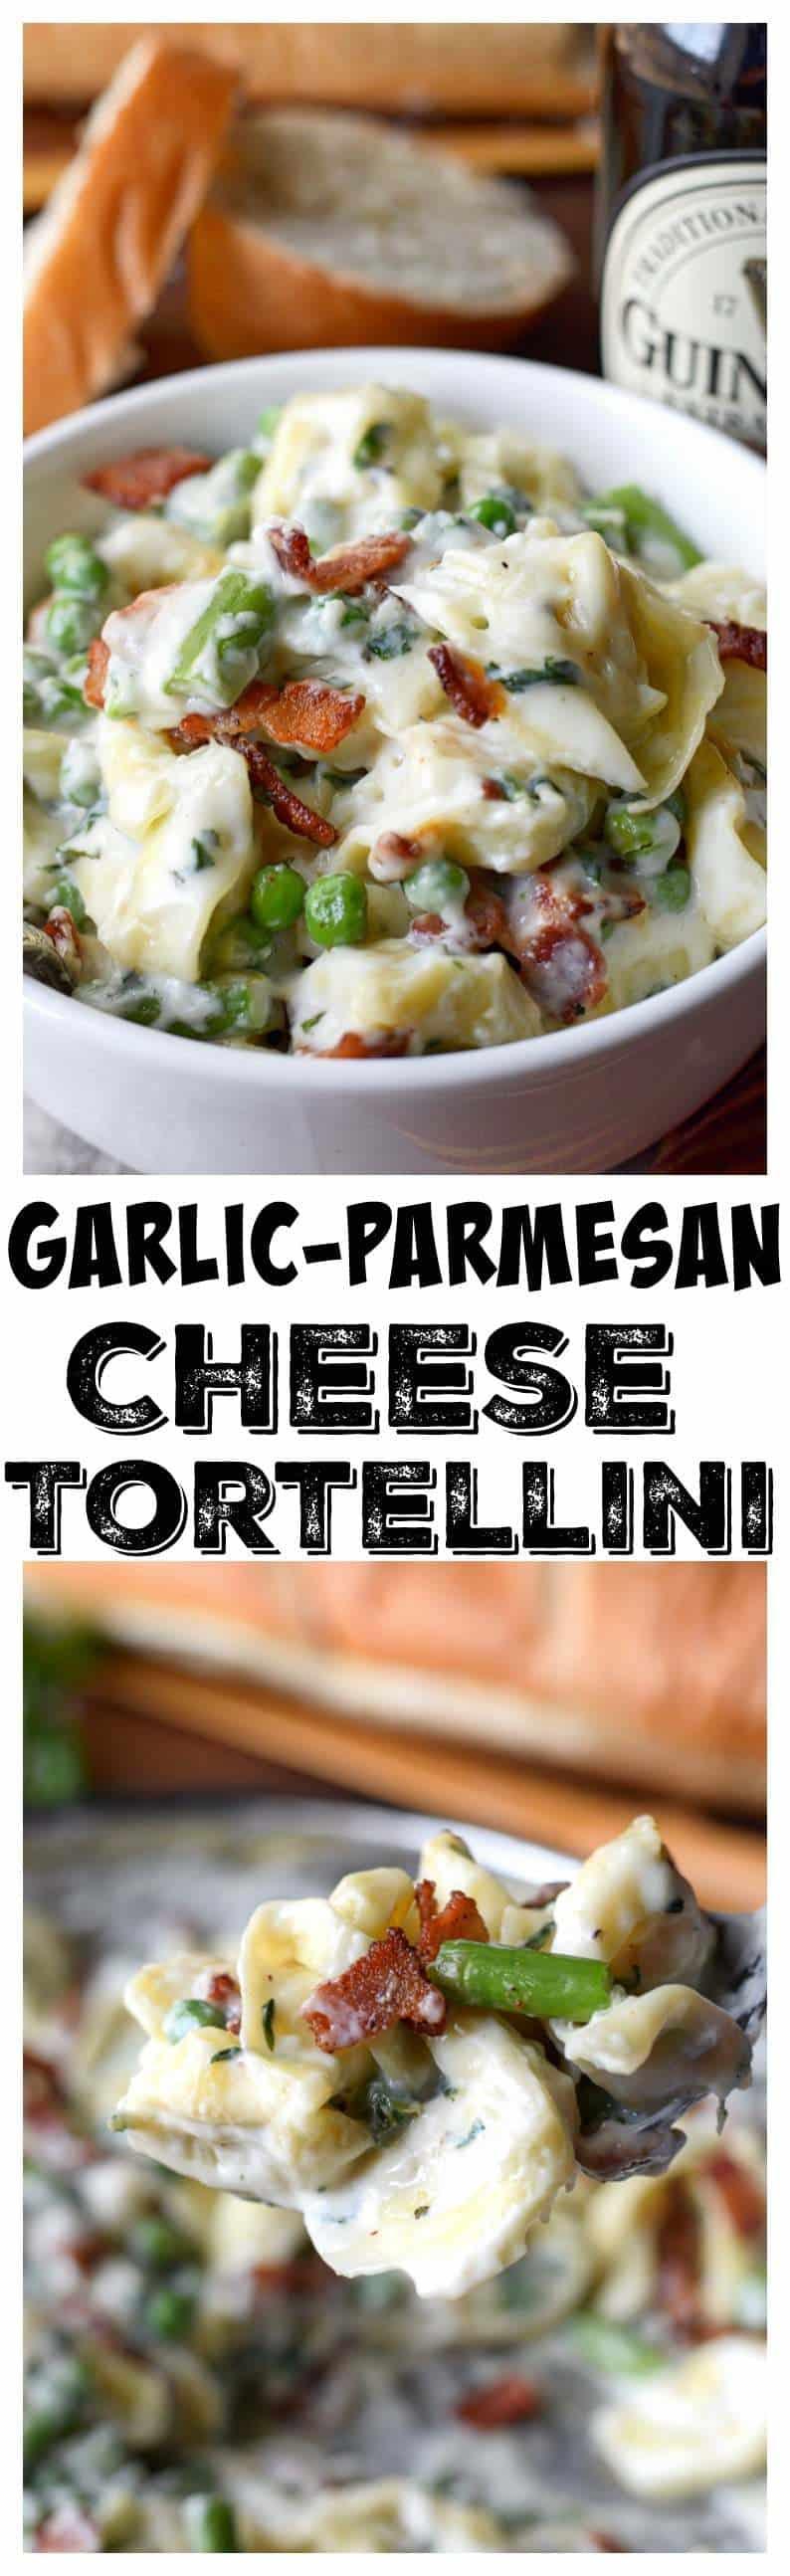 Garlic Parmesan cheese tortellini